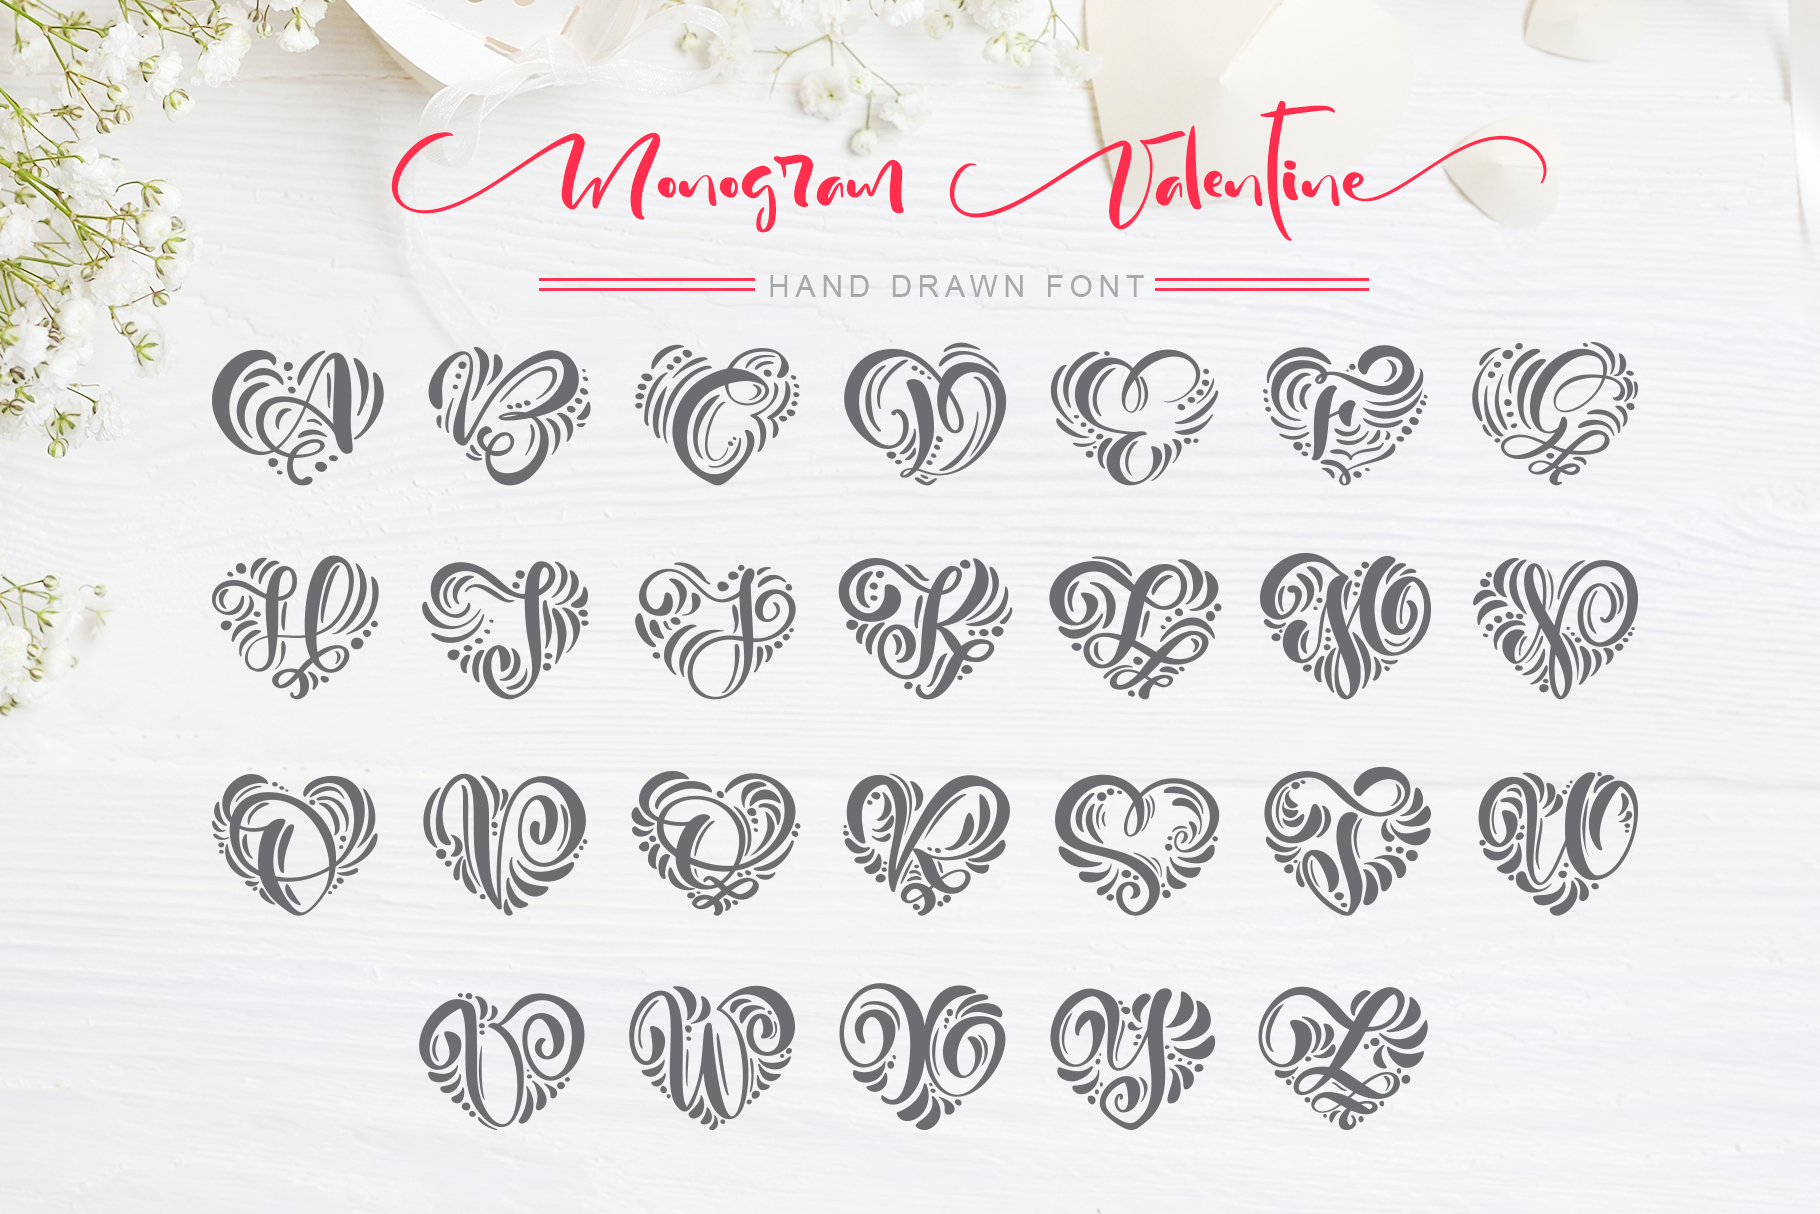 Monogram Valentine Font example image 4